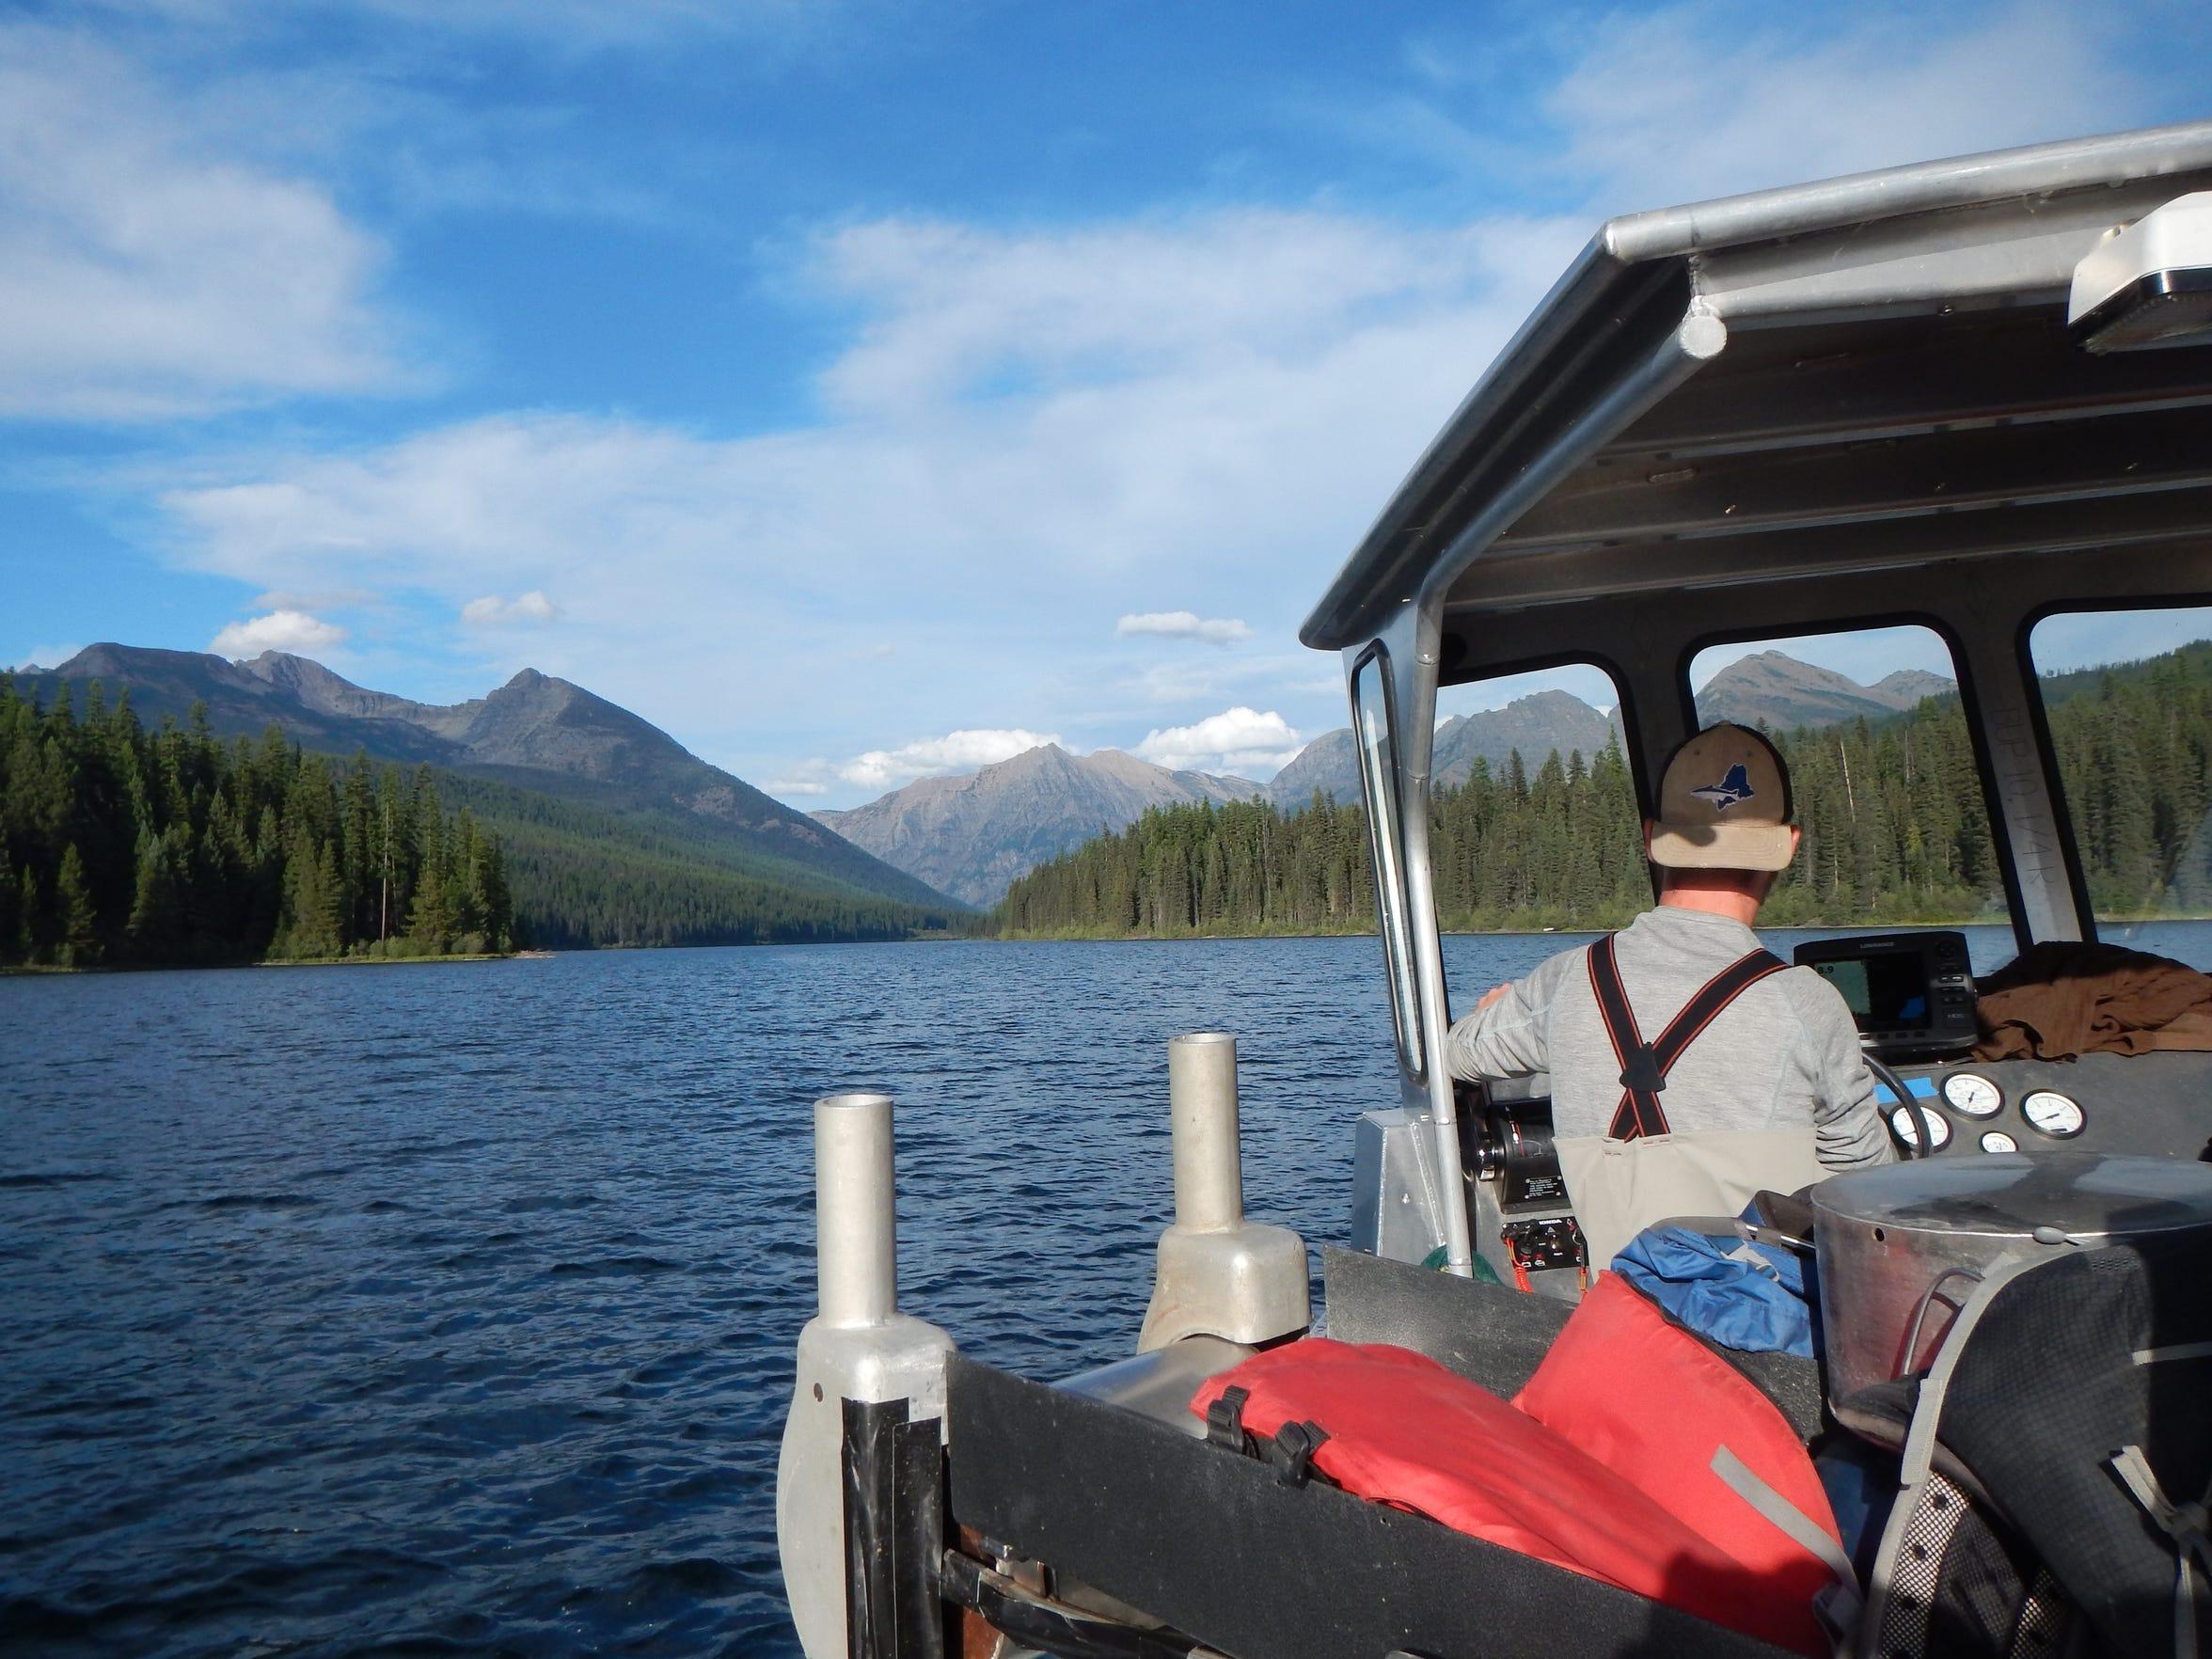 U.S. Geological Survey biologist Andrew Lamont navigates